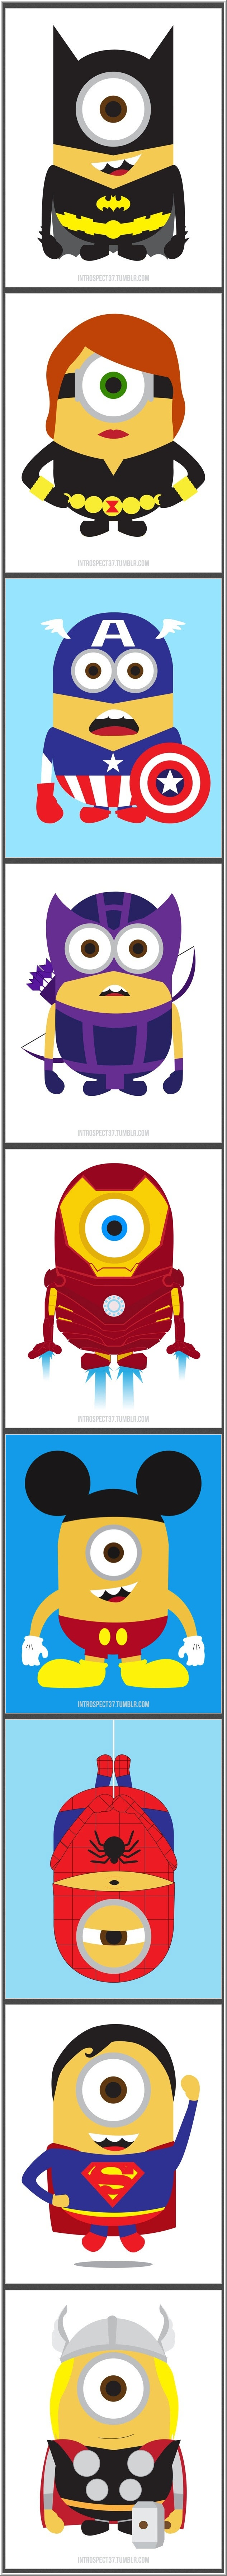 Minions Superheroes